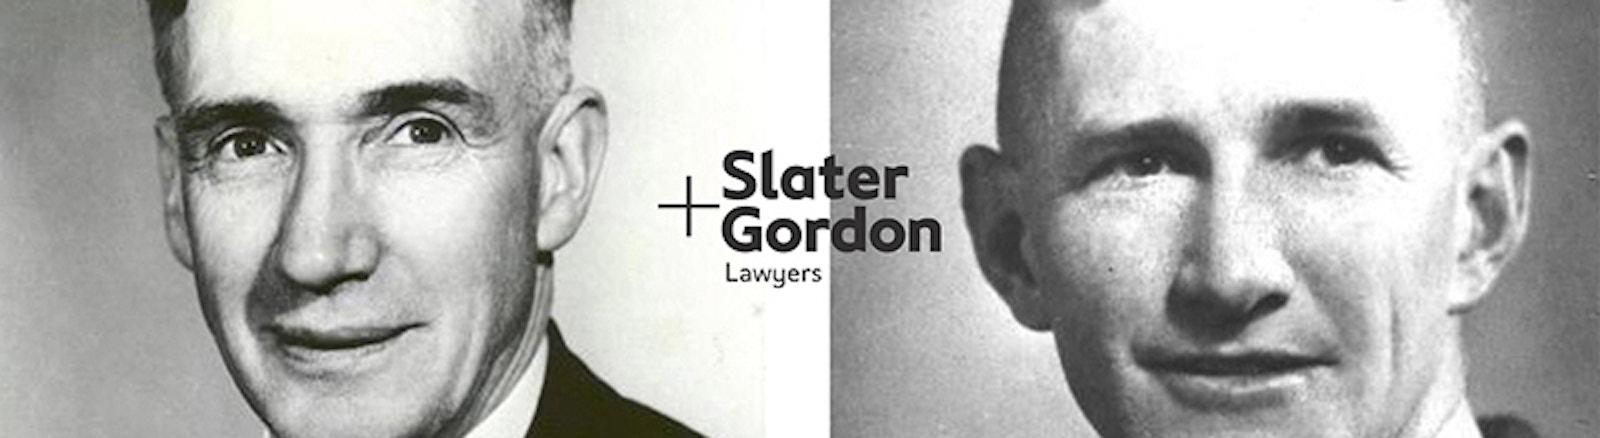 Slatergordonfounders